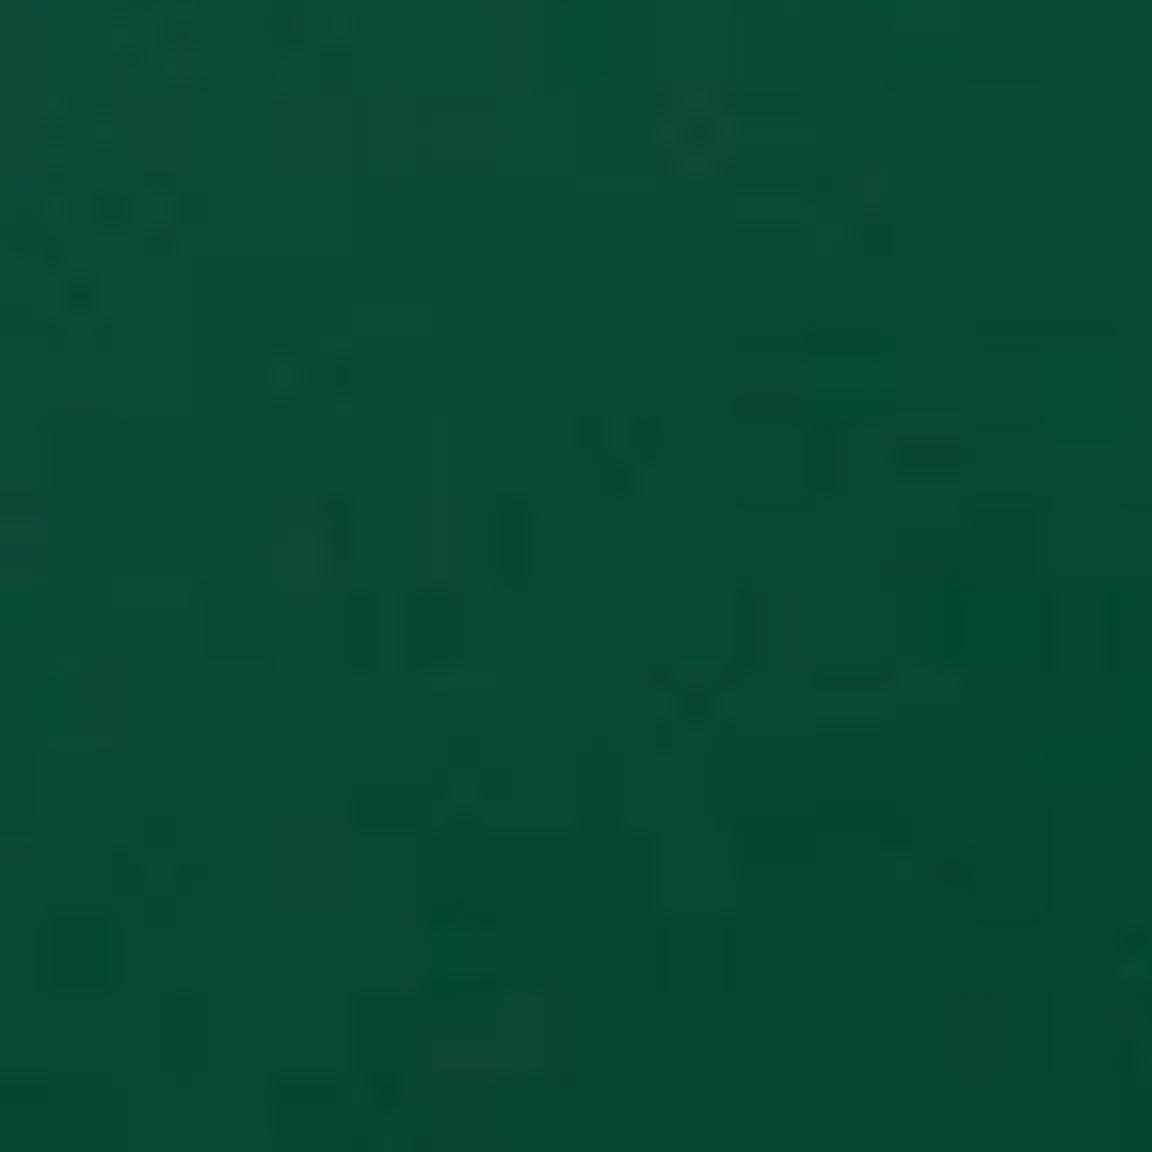 Green Ceramic Steel - Plain Surface